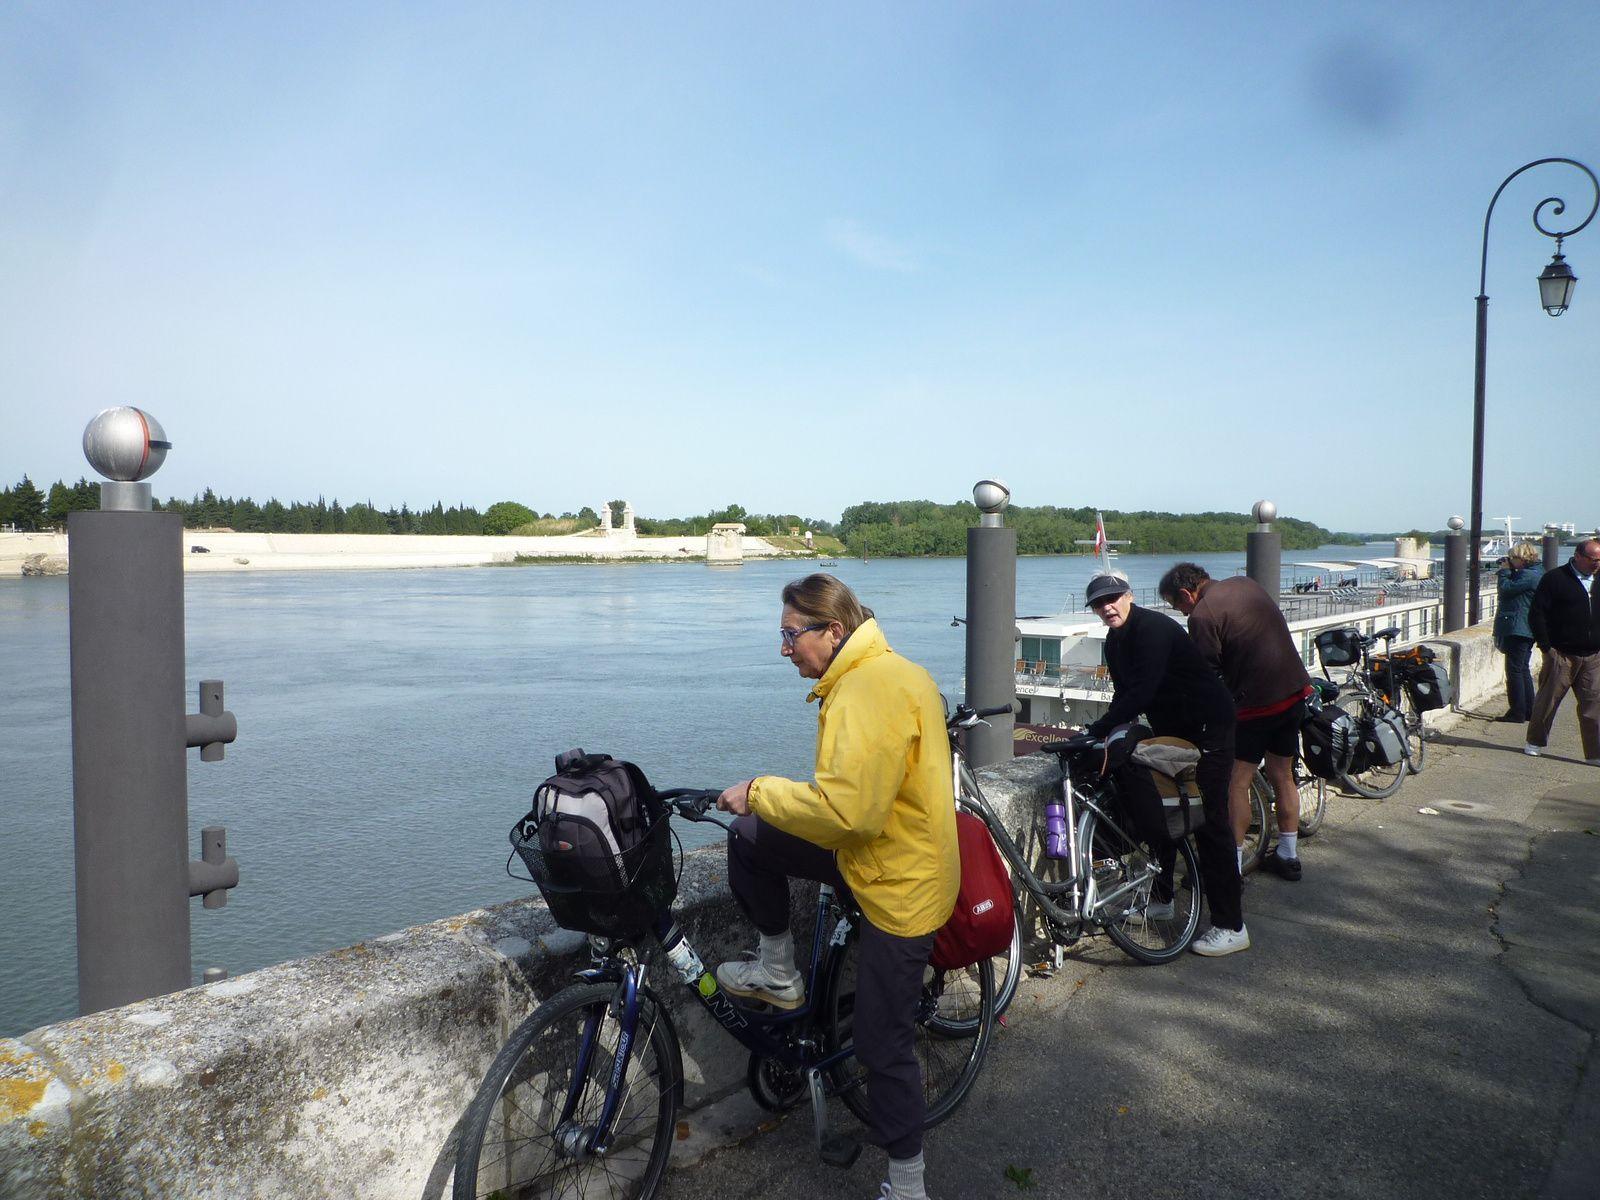 La Camargue à vélo: autour de ViaRhôna